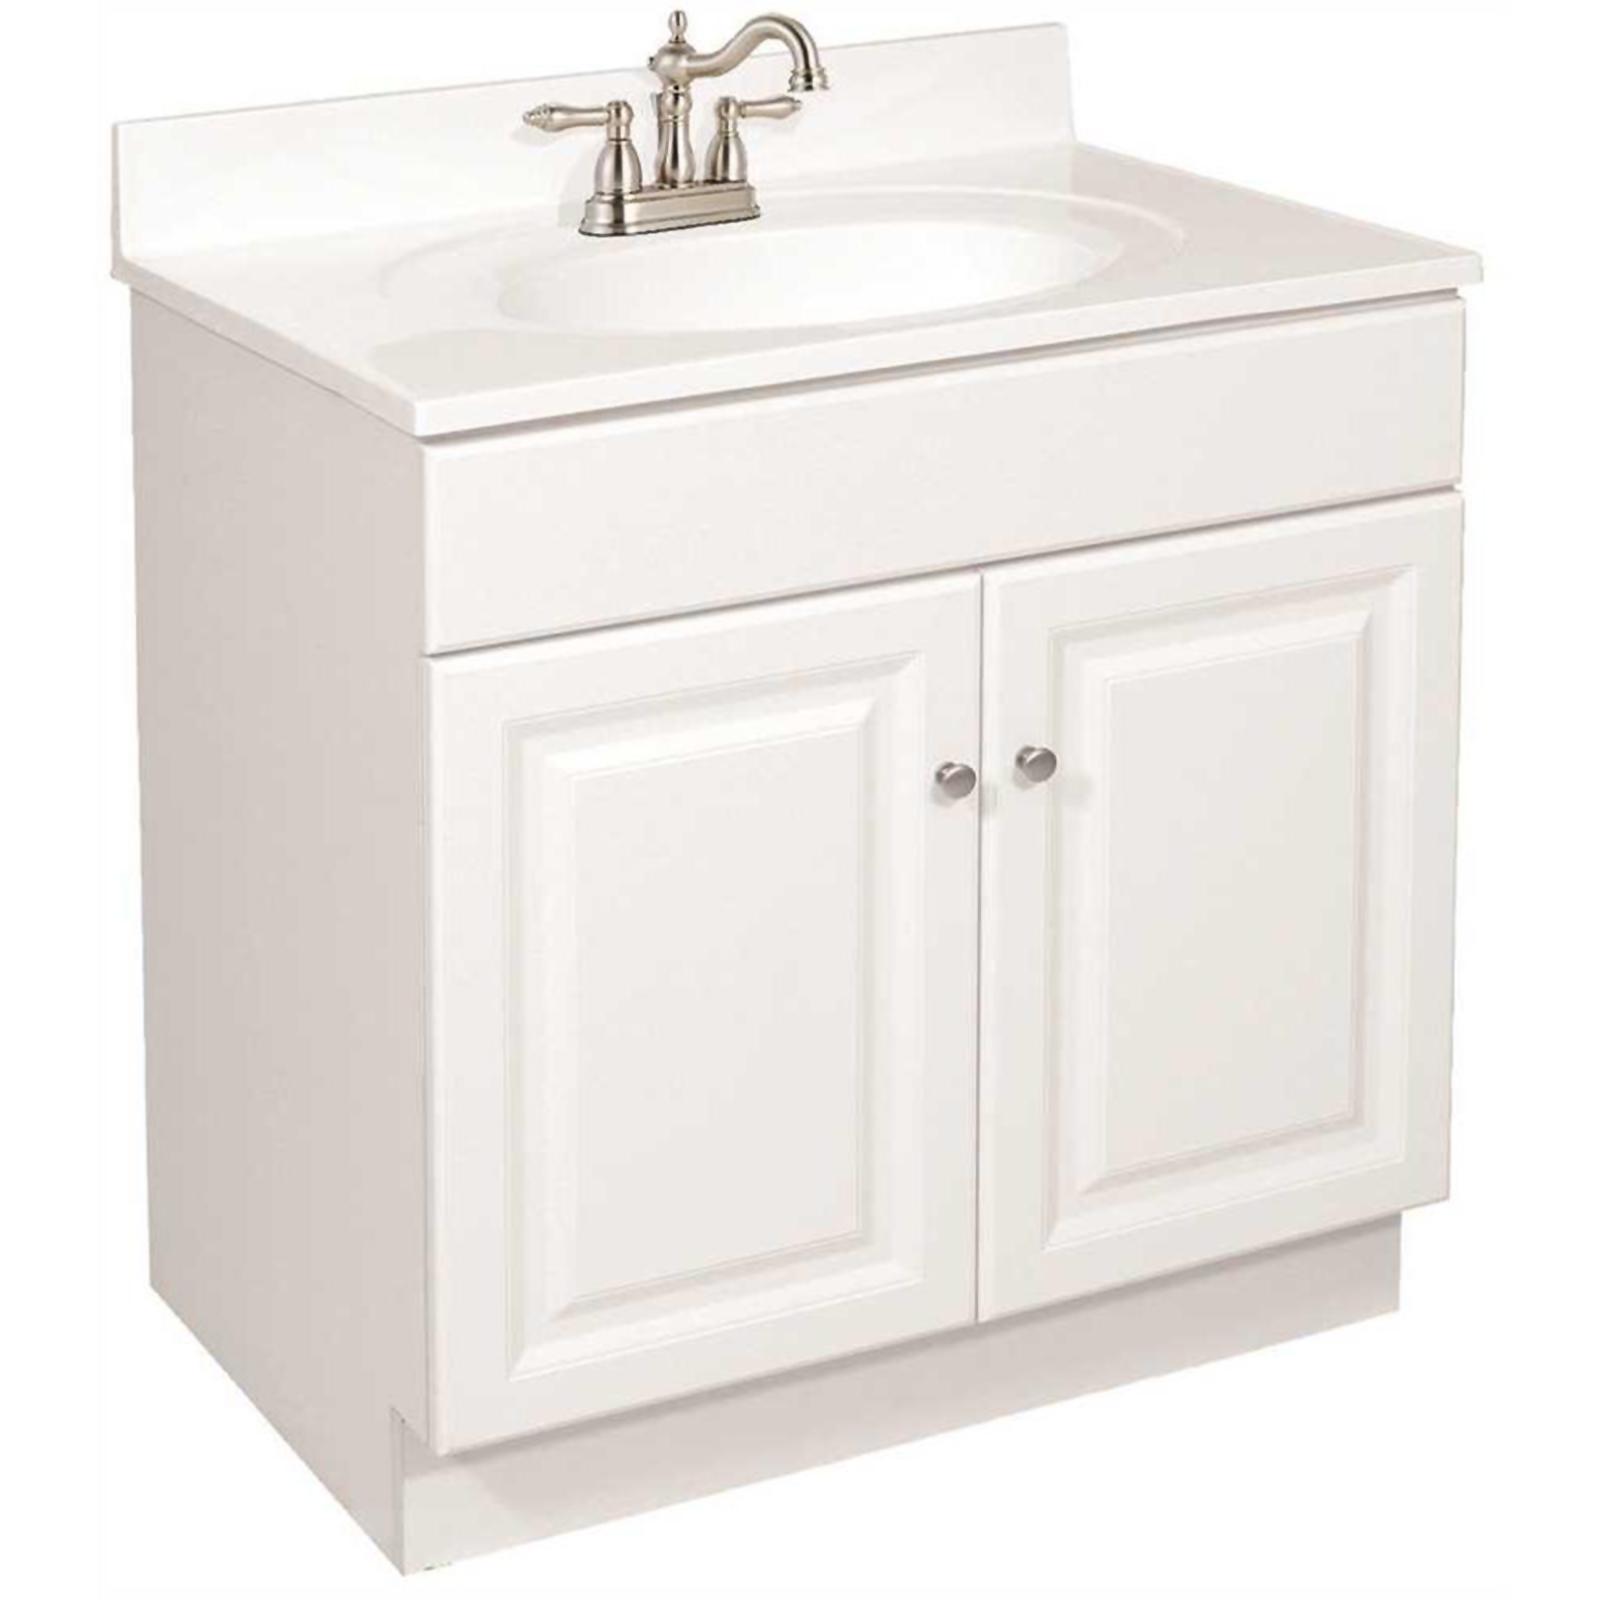 Design House Wyndham Wood Bathroom Vanity Cabinet Sears Marketplace